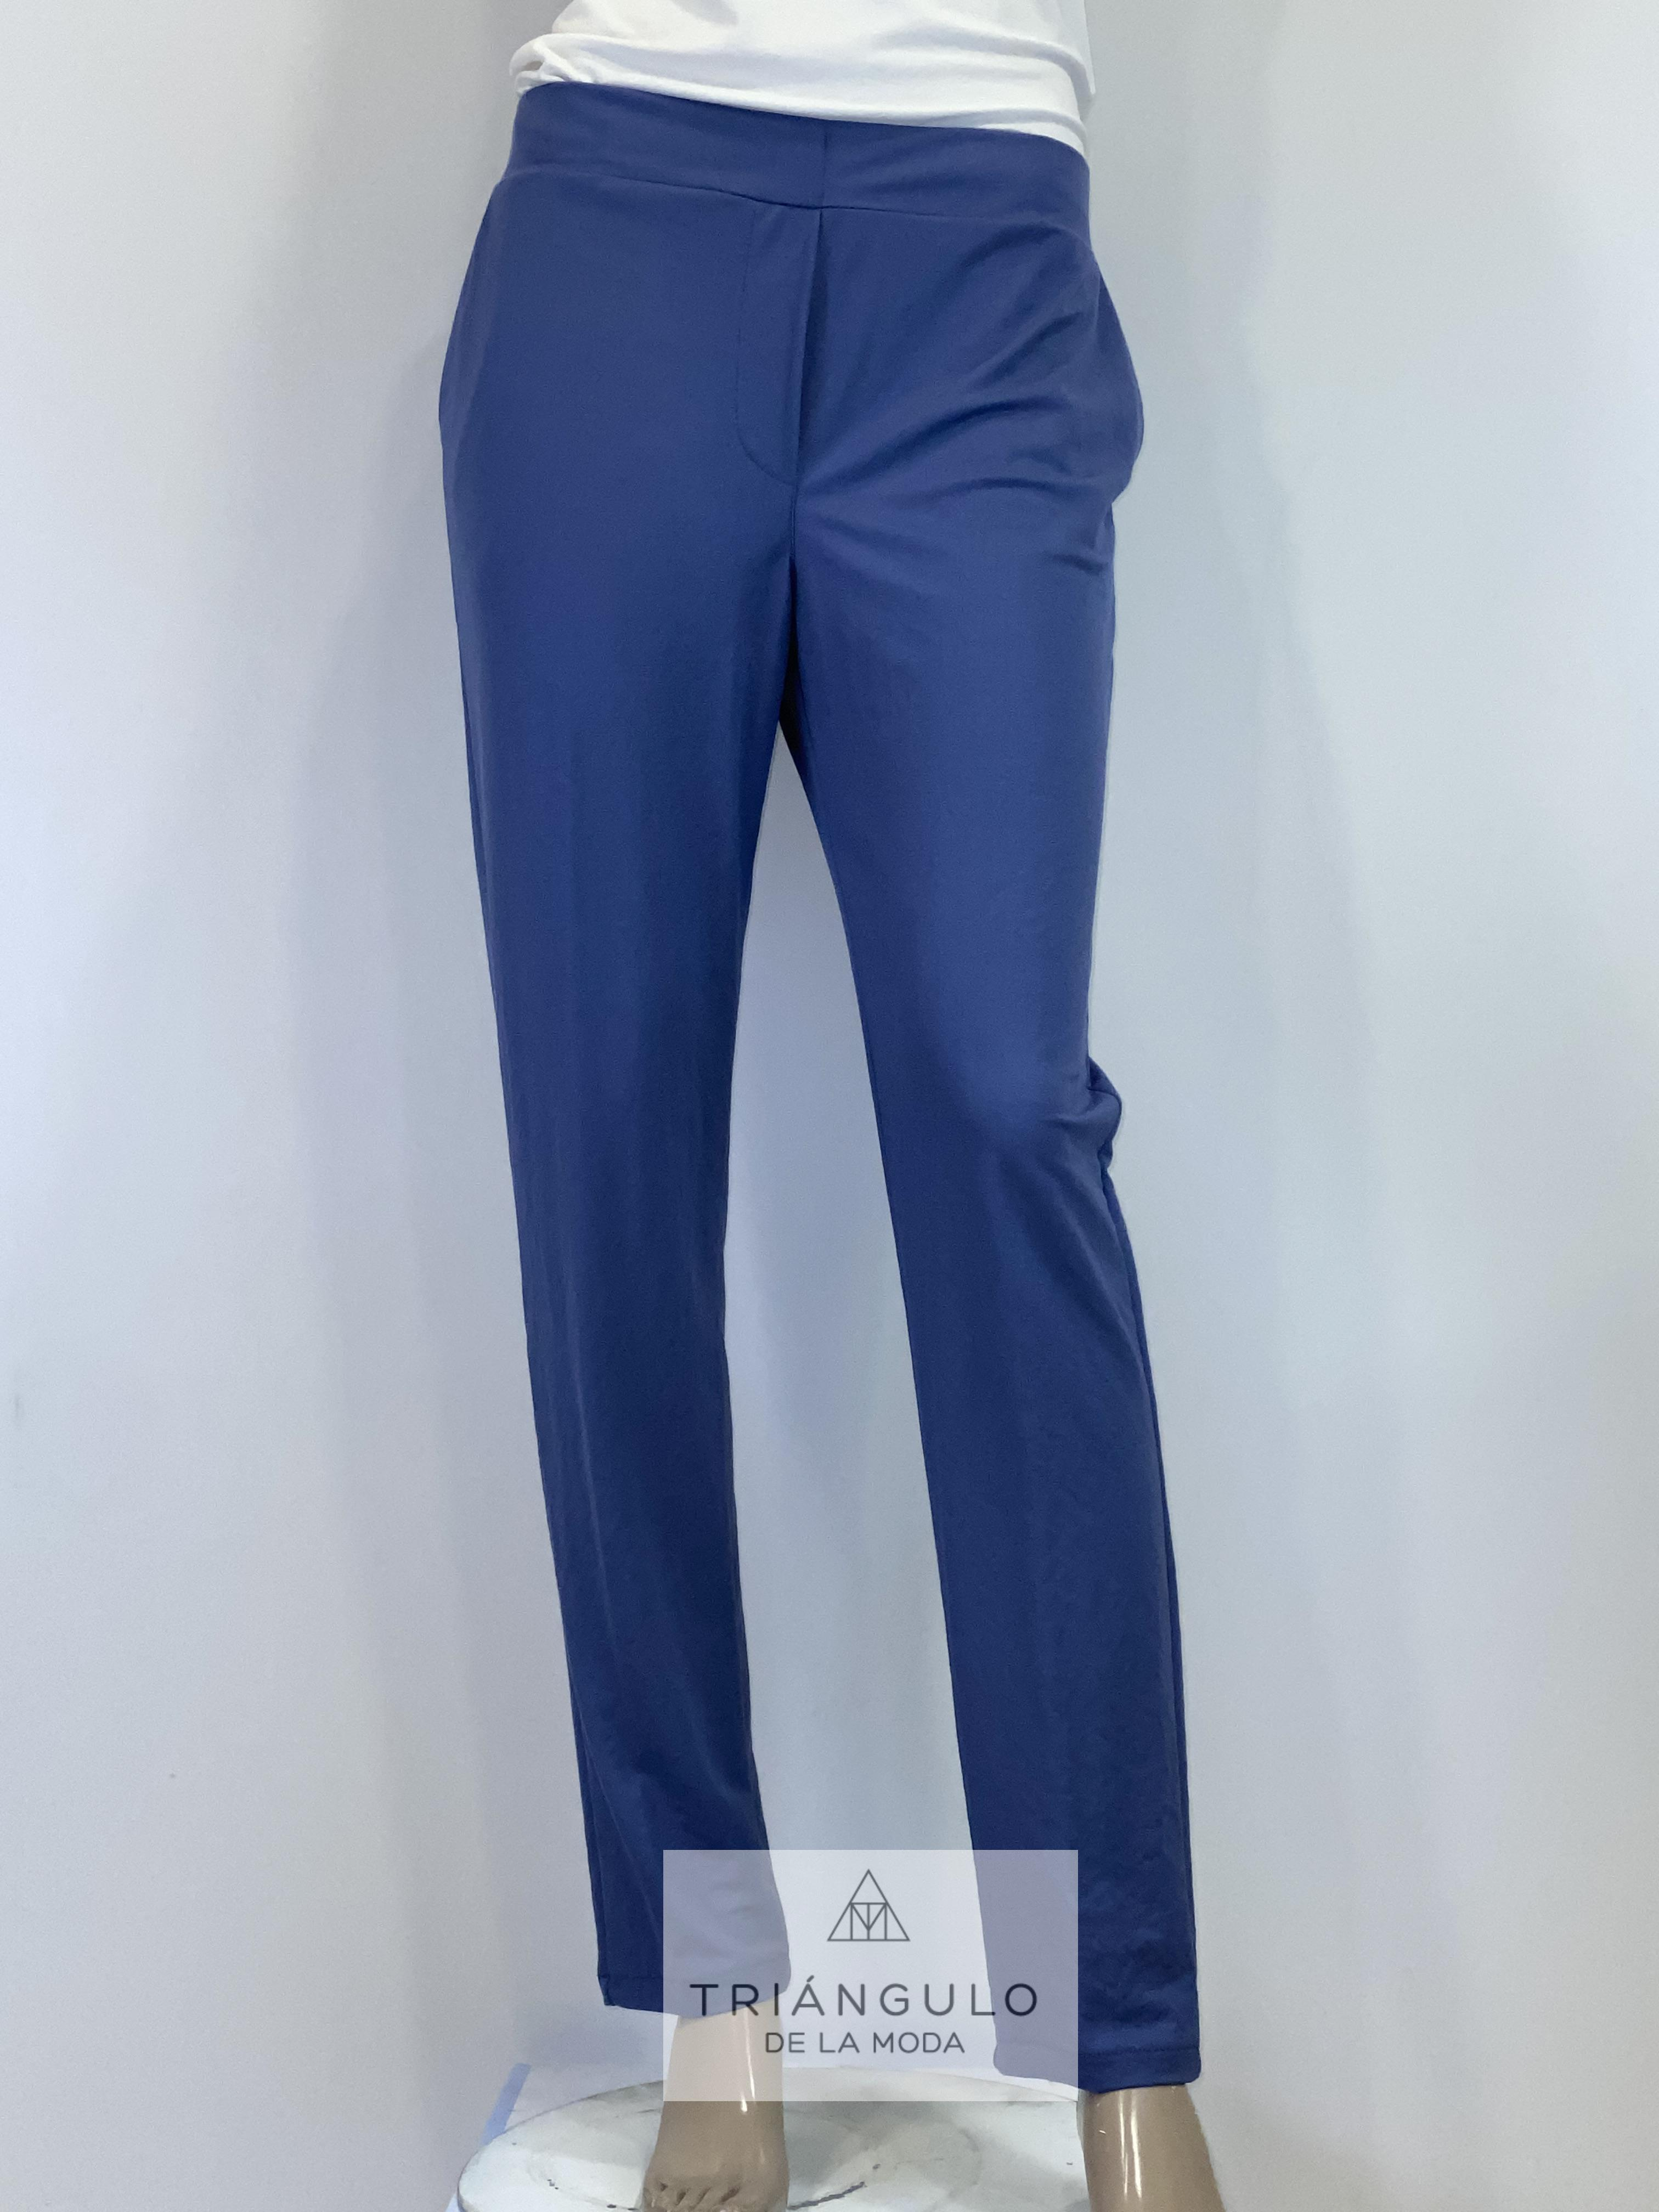 Tienda online del Triangulo de la Moda pantalon